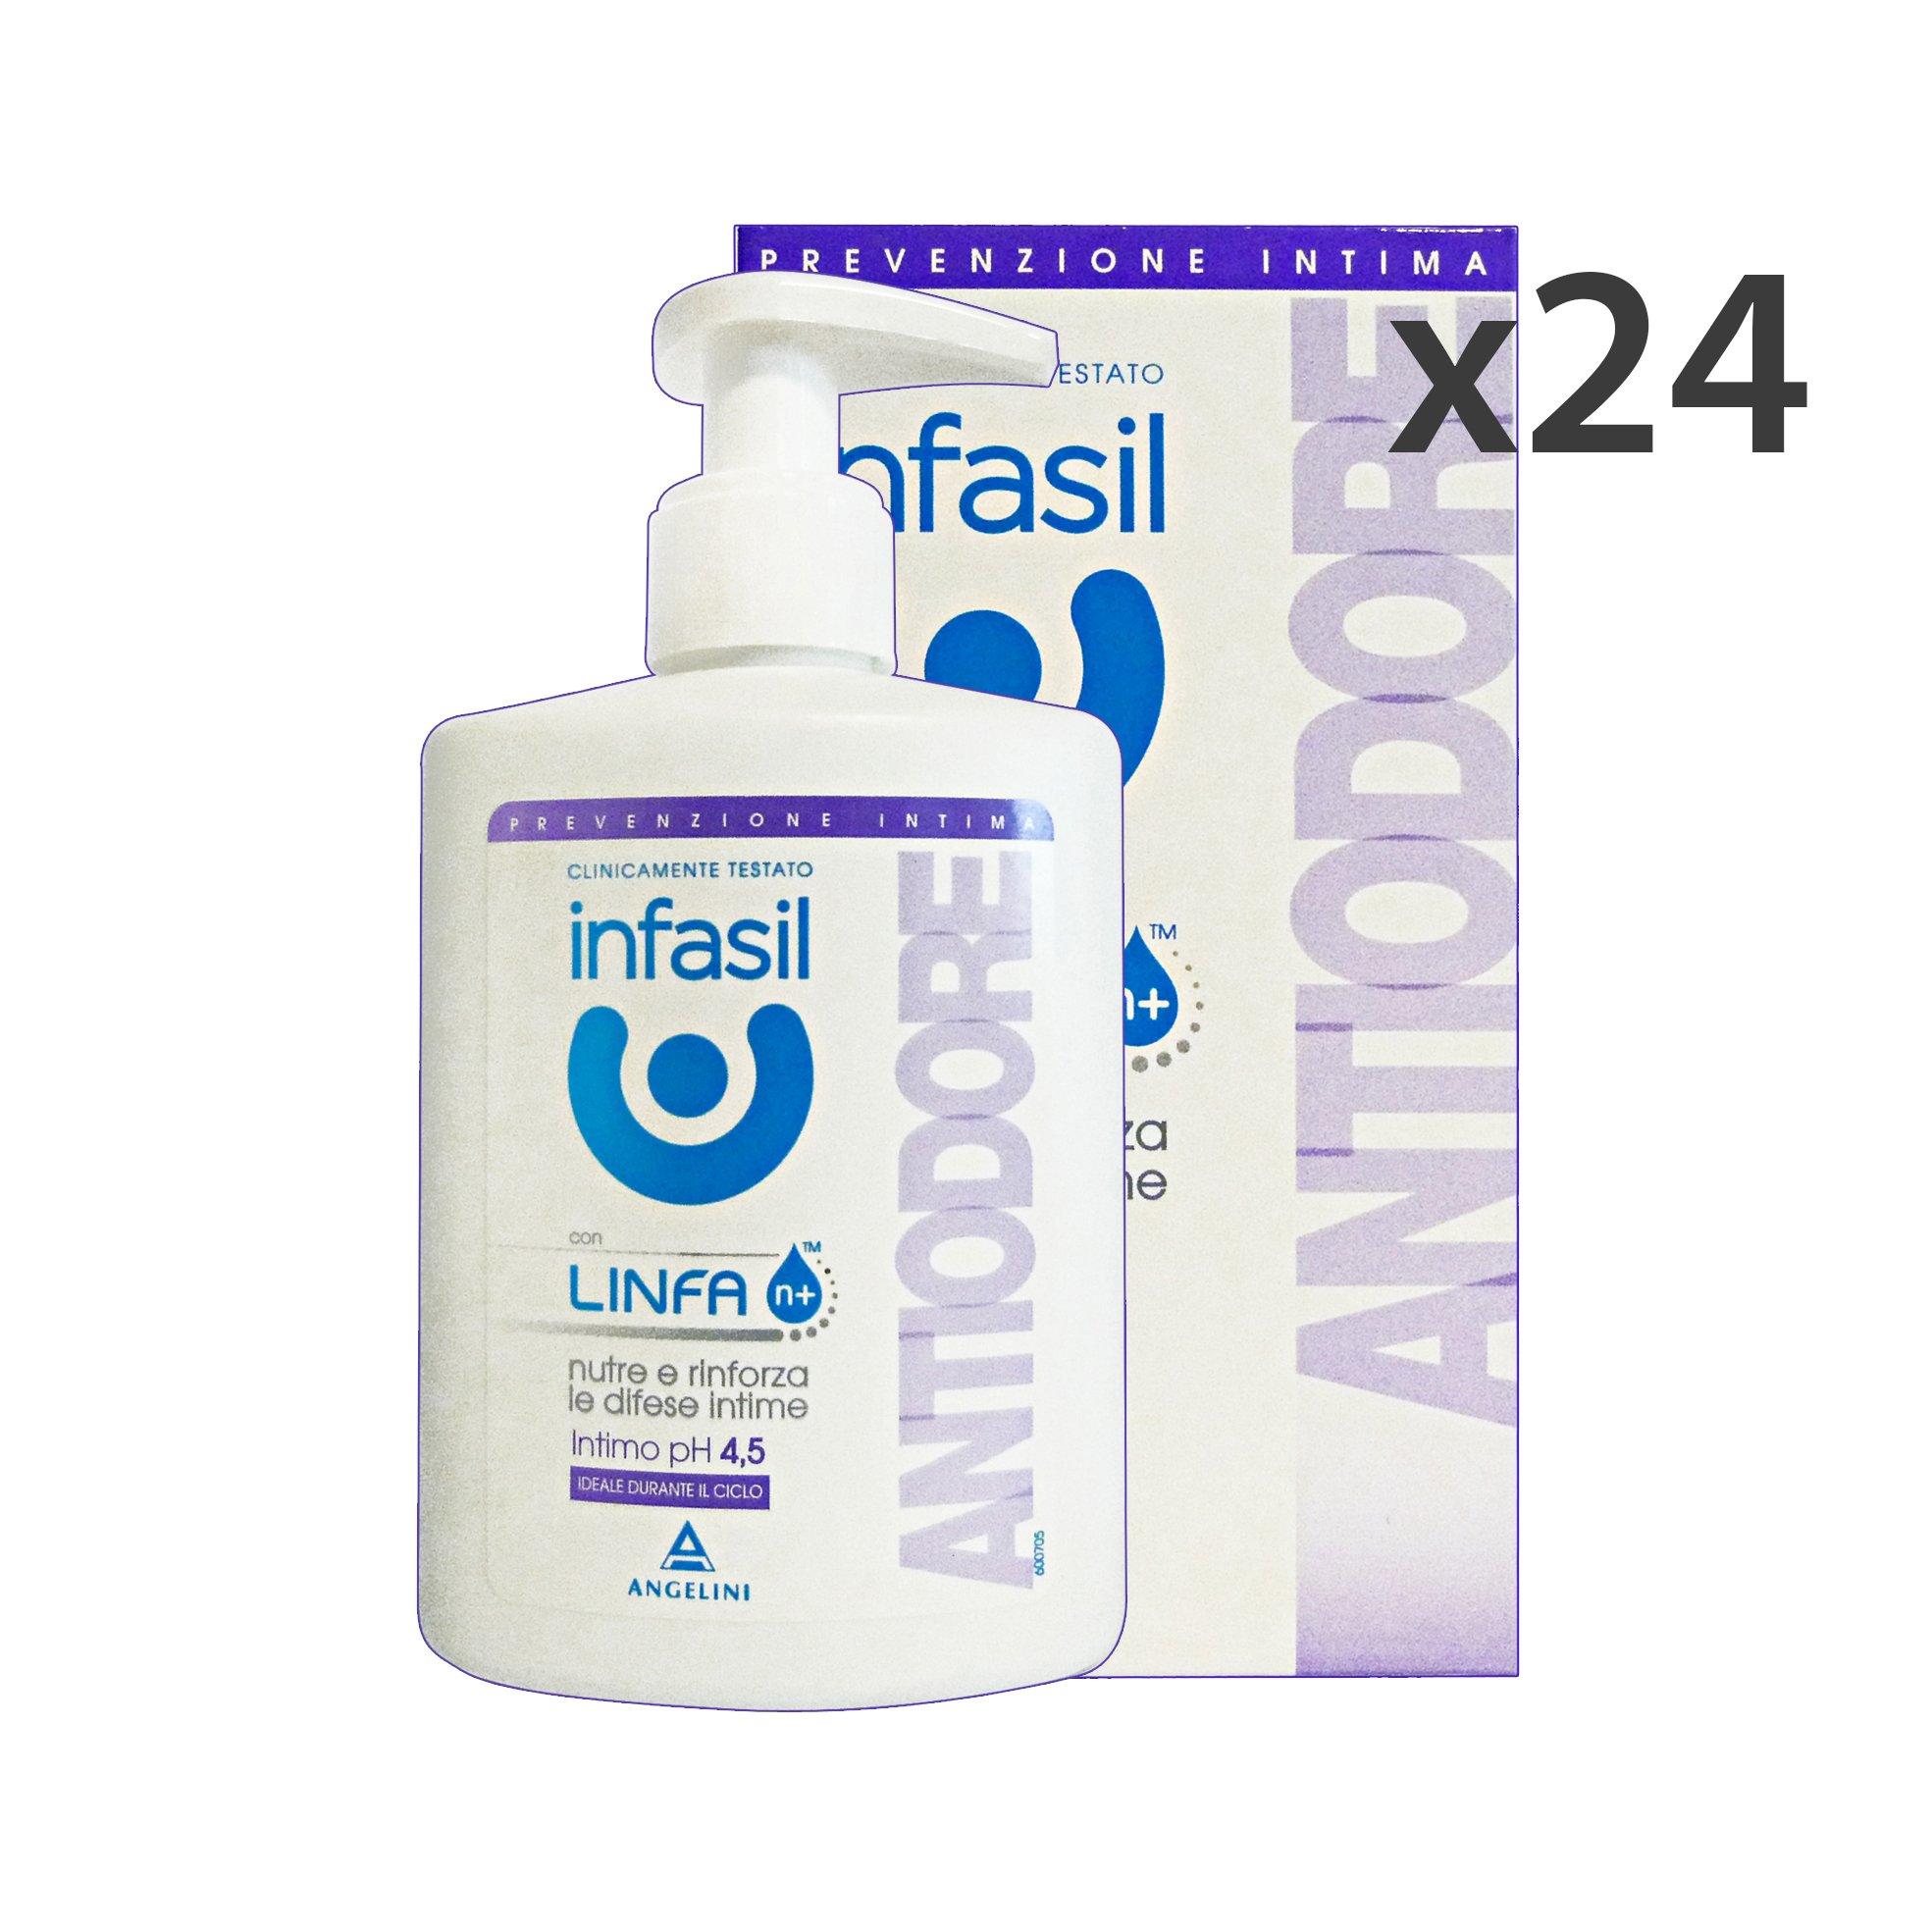 Set 24 INFASIL Sapone INTIMO AntiODORE 200 Ml. Saponi e cosmetici